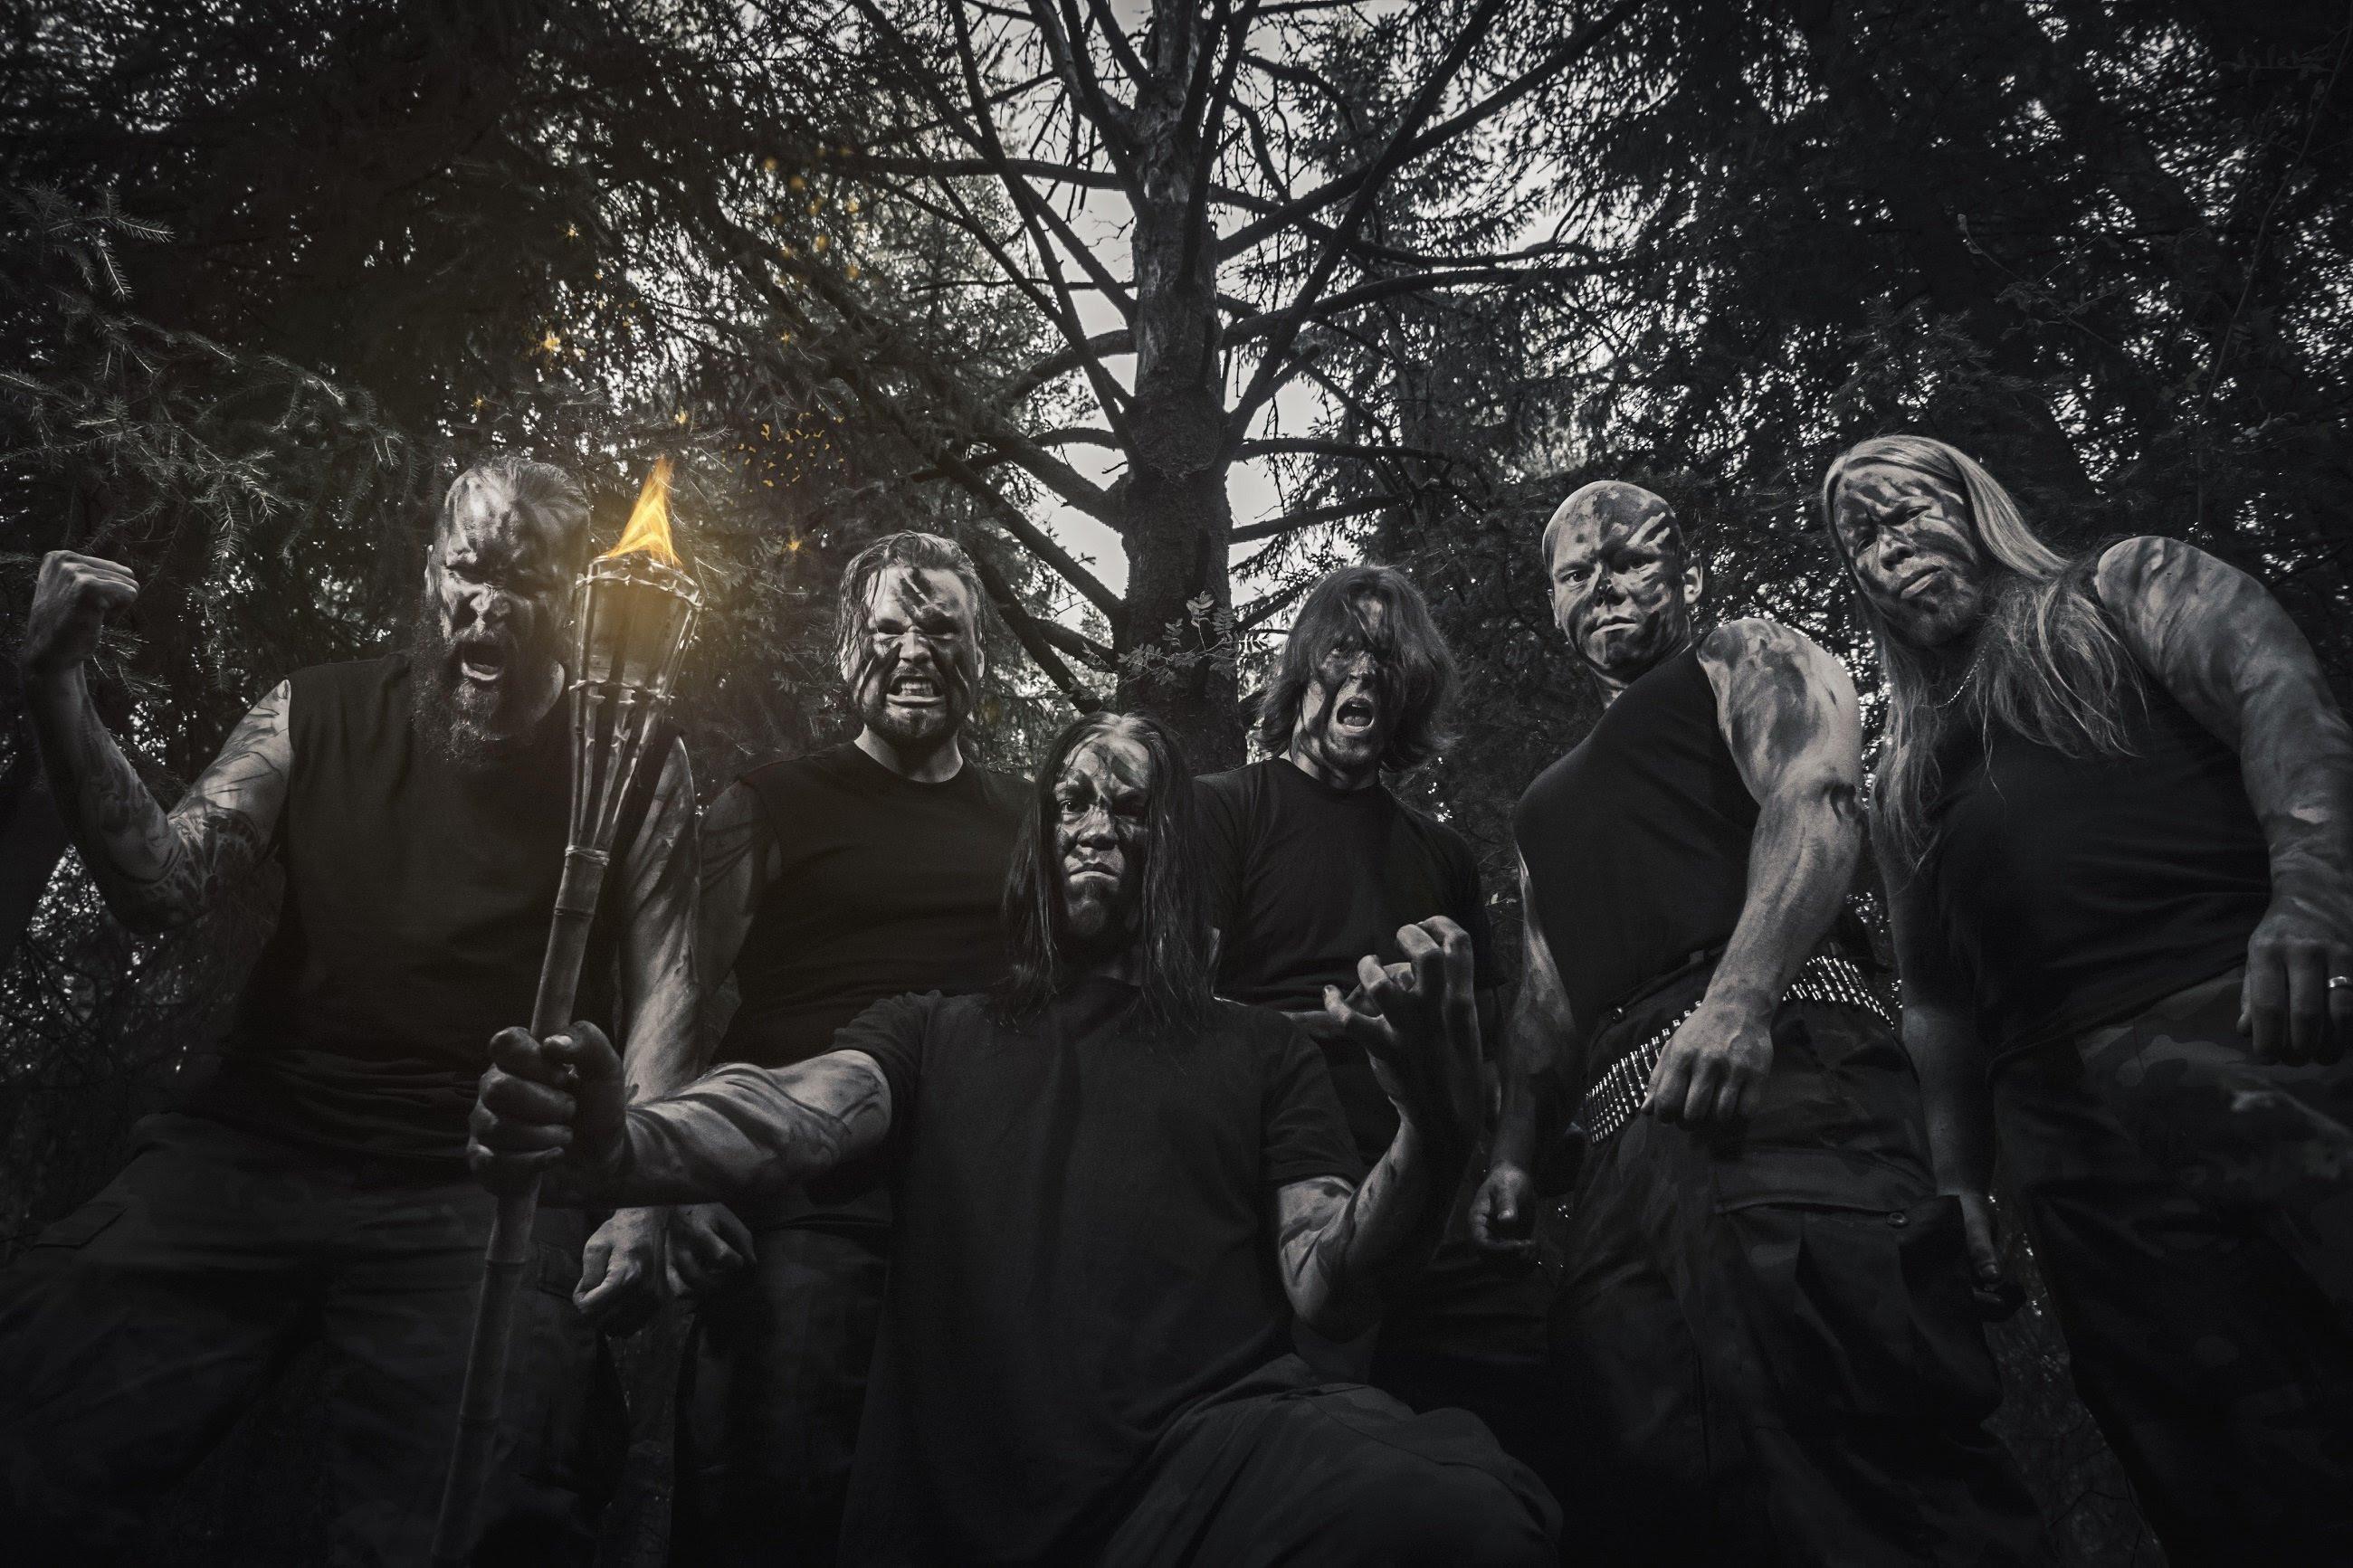 Promo pic by: Jani Kakko